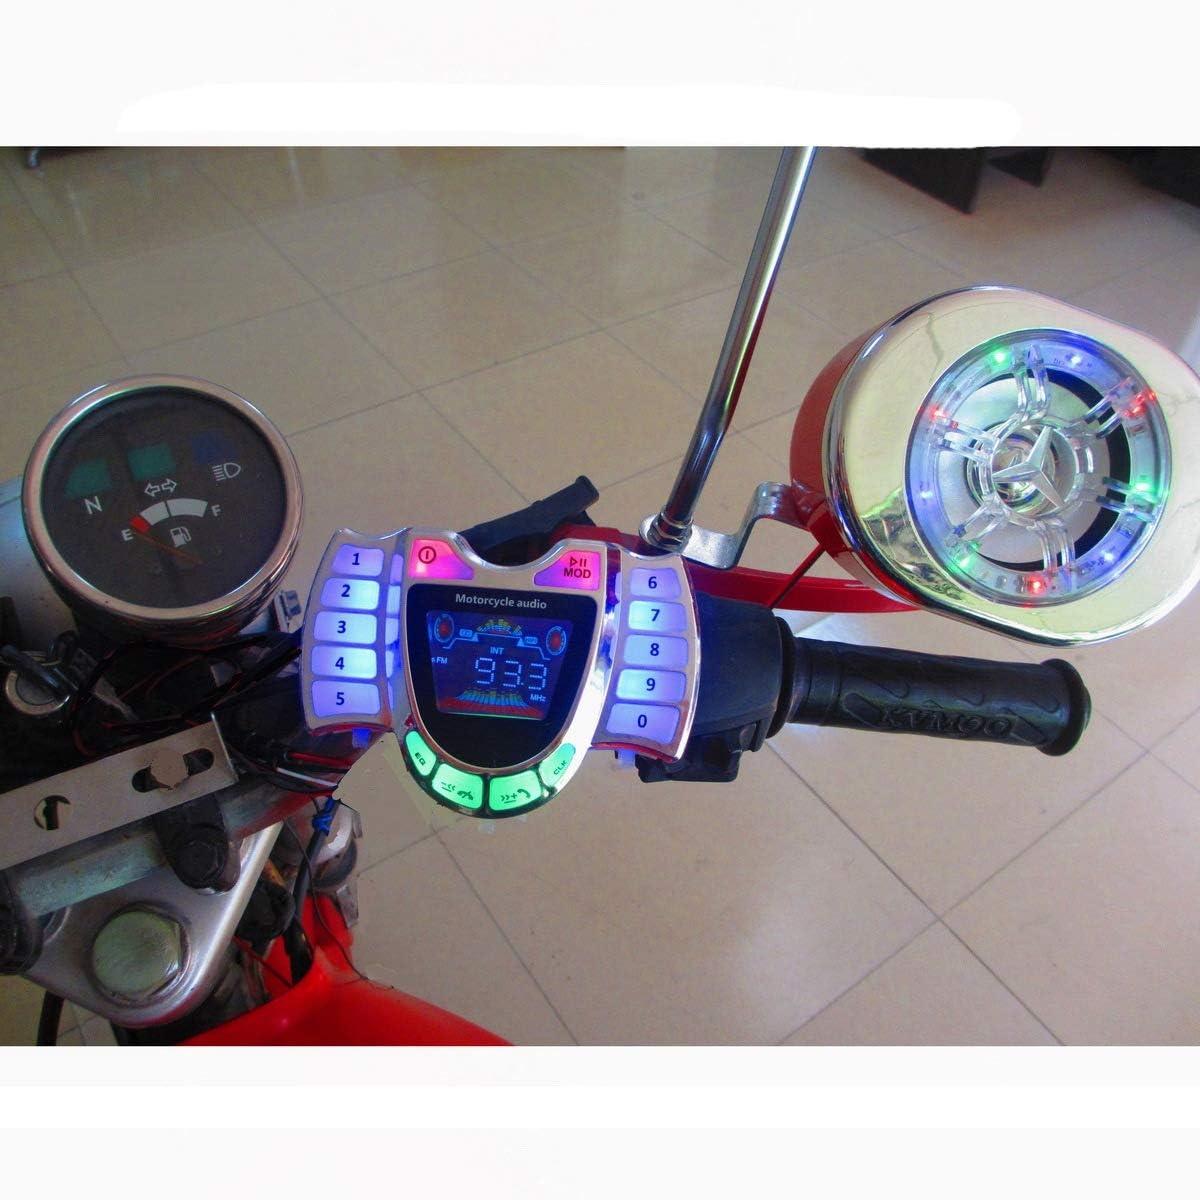 Semoic Motorcycle Stereo Speakers MP3 Player Waterproof FM Audio for Motor Scooter Bike ATV UTV